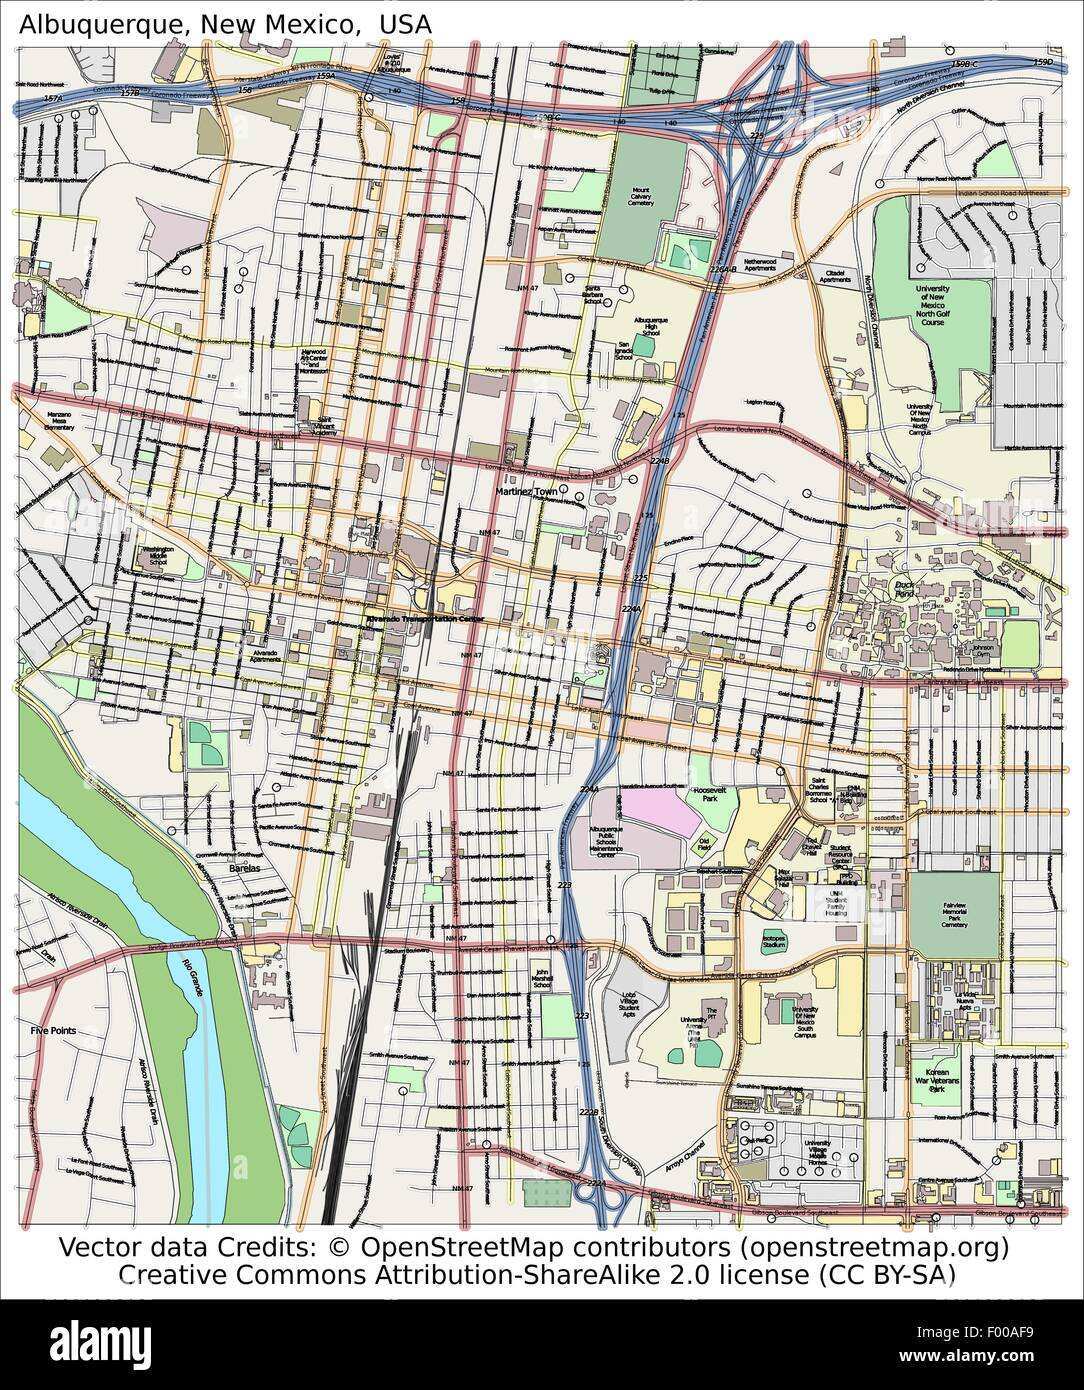 Albuquerque New Mexico USA Country City Island State Location Map - Usa country map